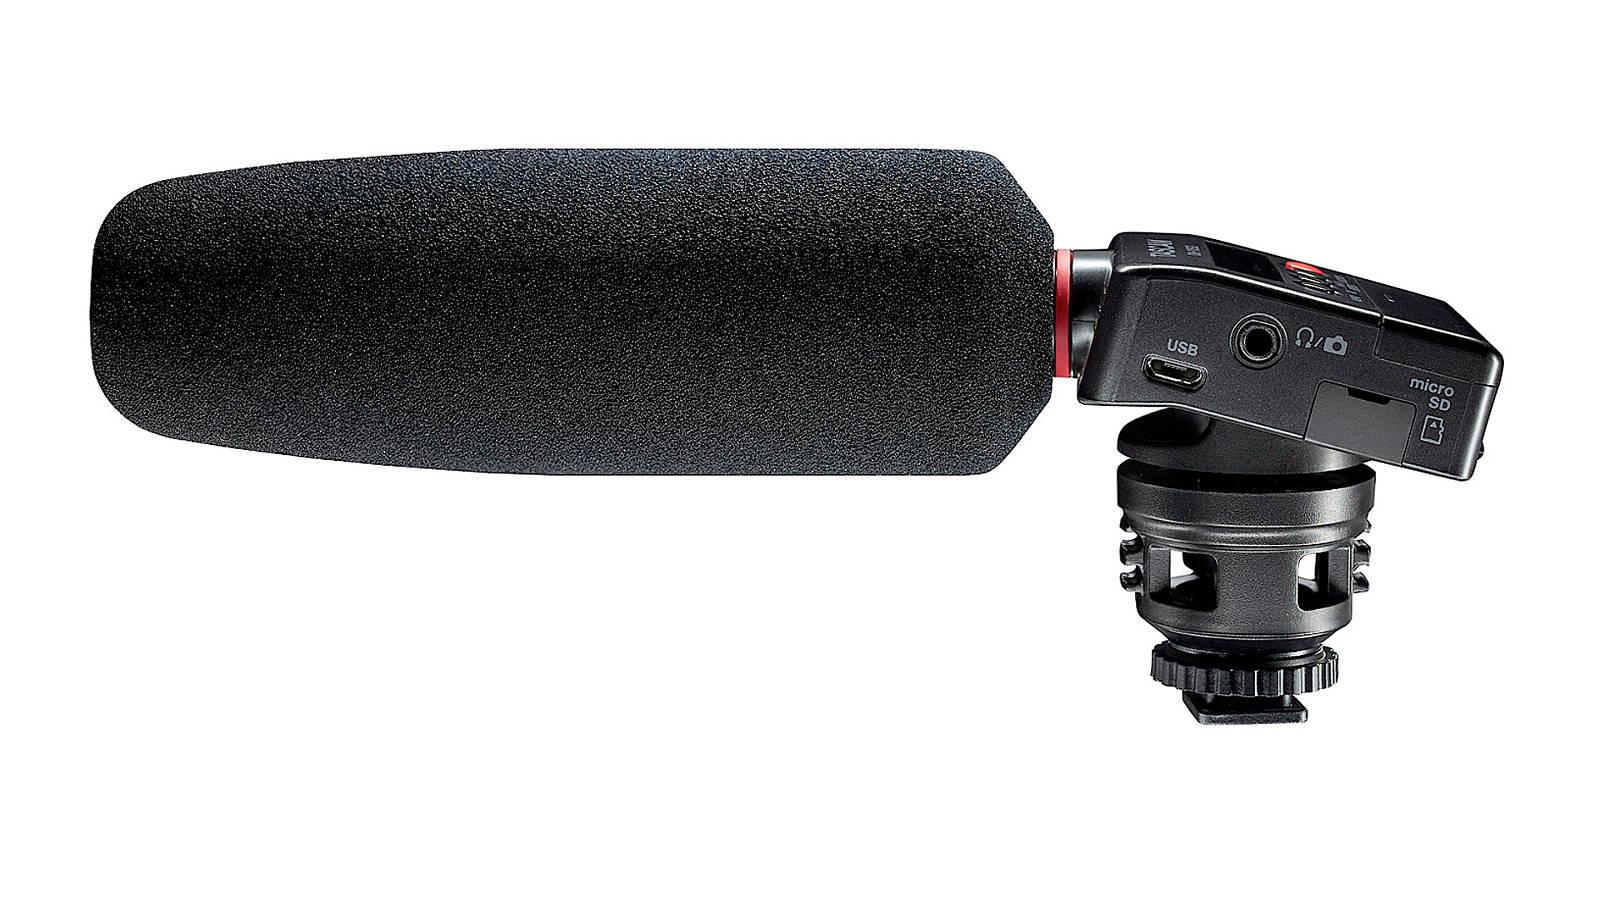 Tascam DR-10SG Audiorecorder mit Richtmikrofon